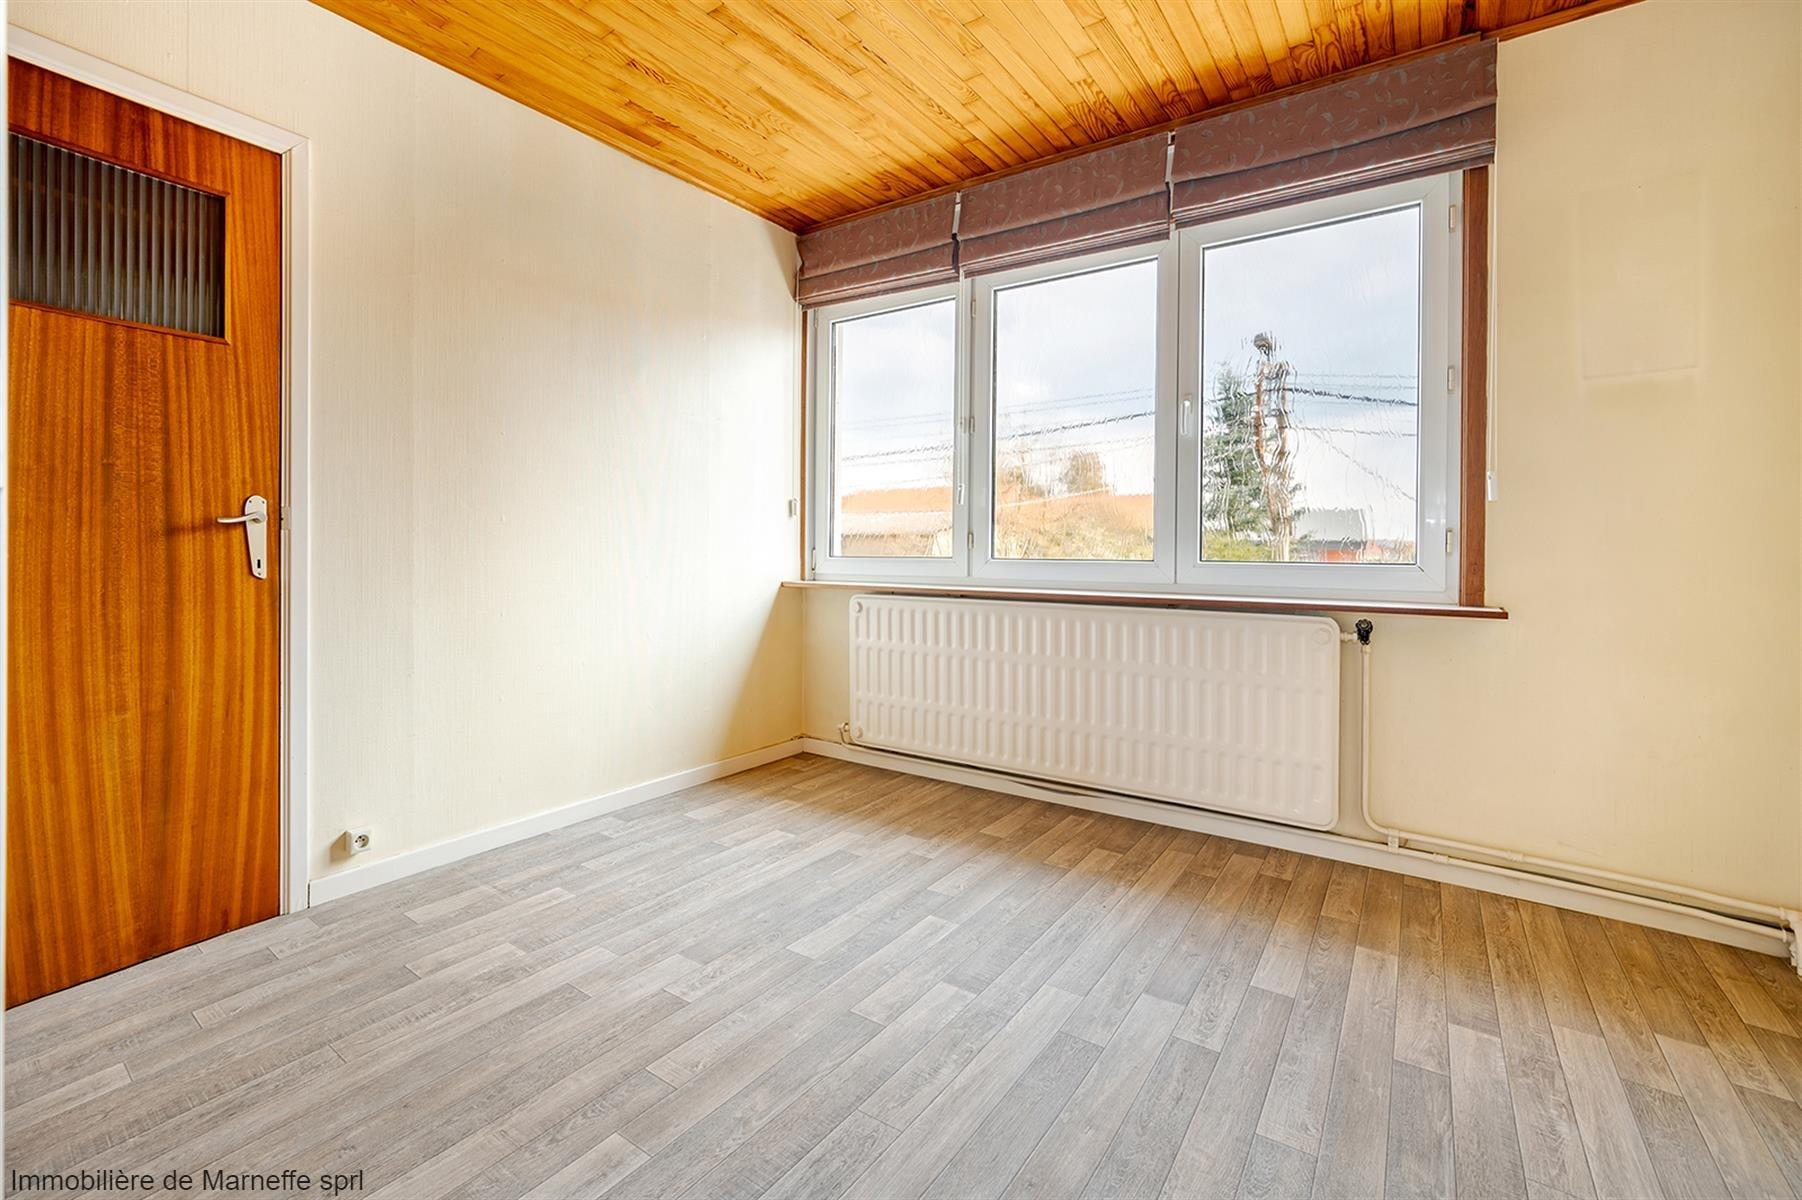 Maison - Berloz - #4343525-14